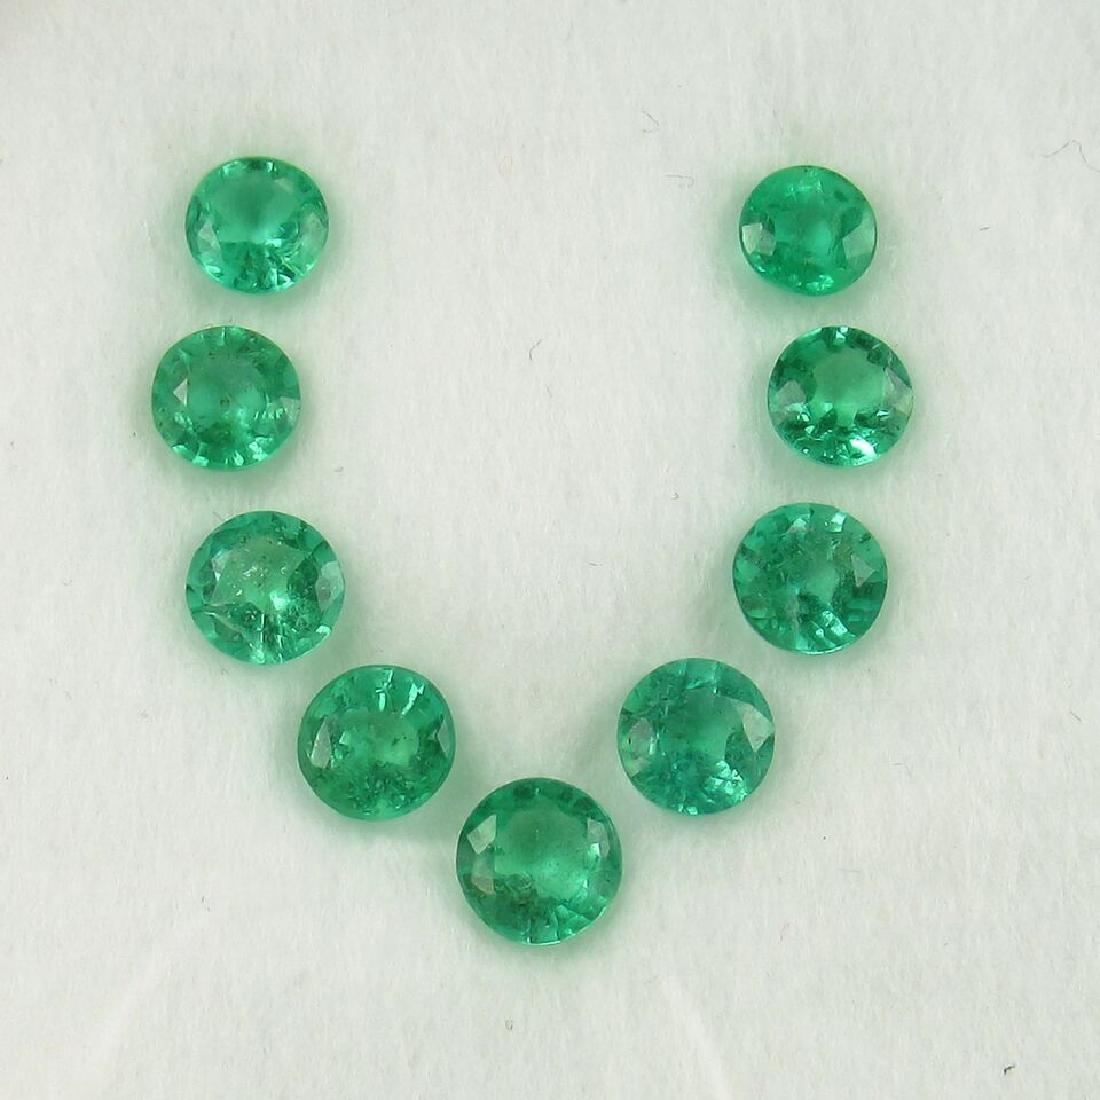 2.98 Carat 9 Loose Round Emeralds Necklace Set